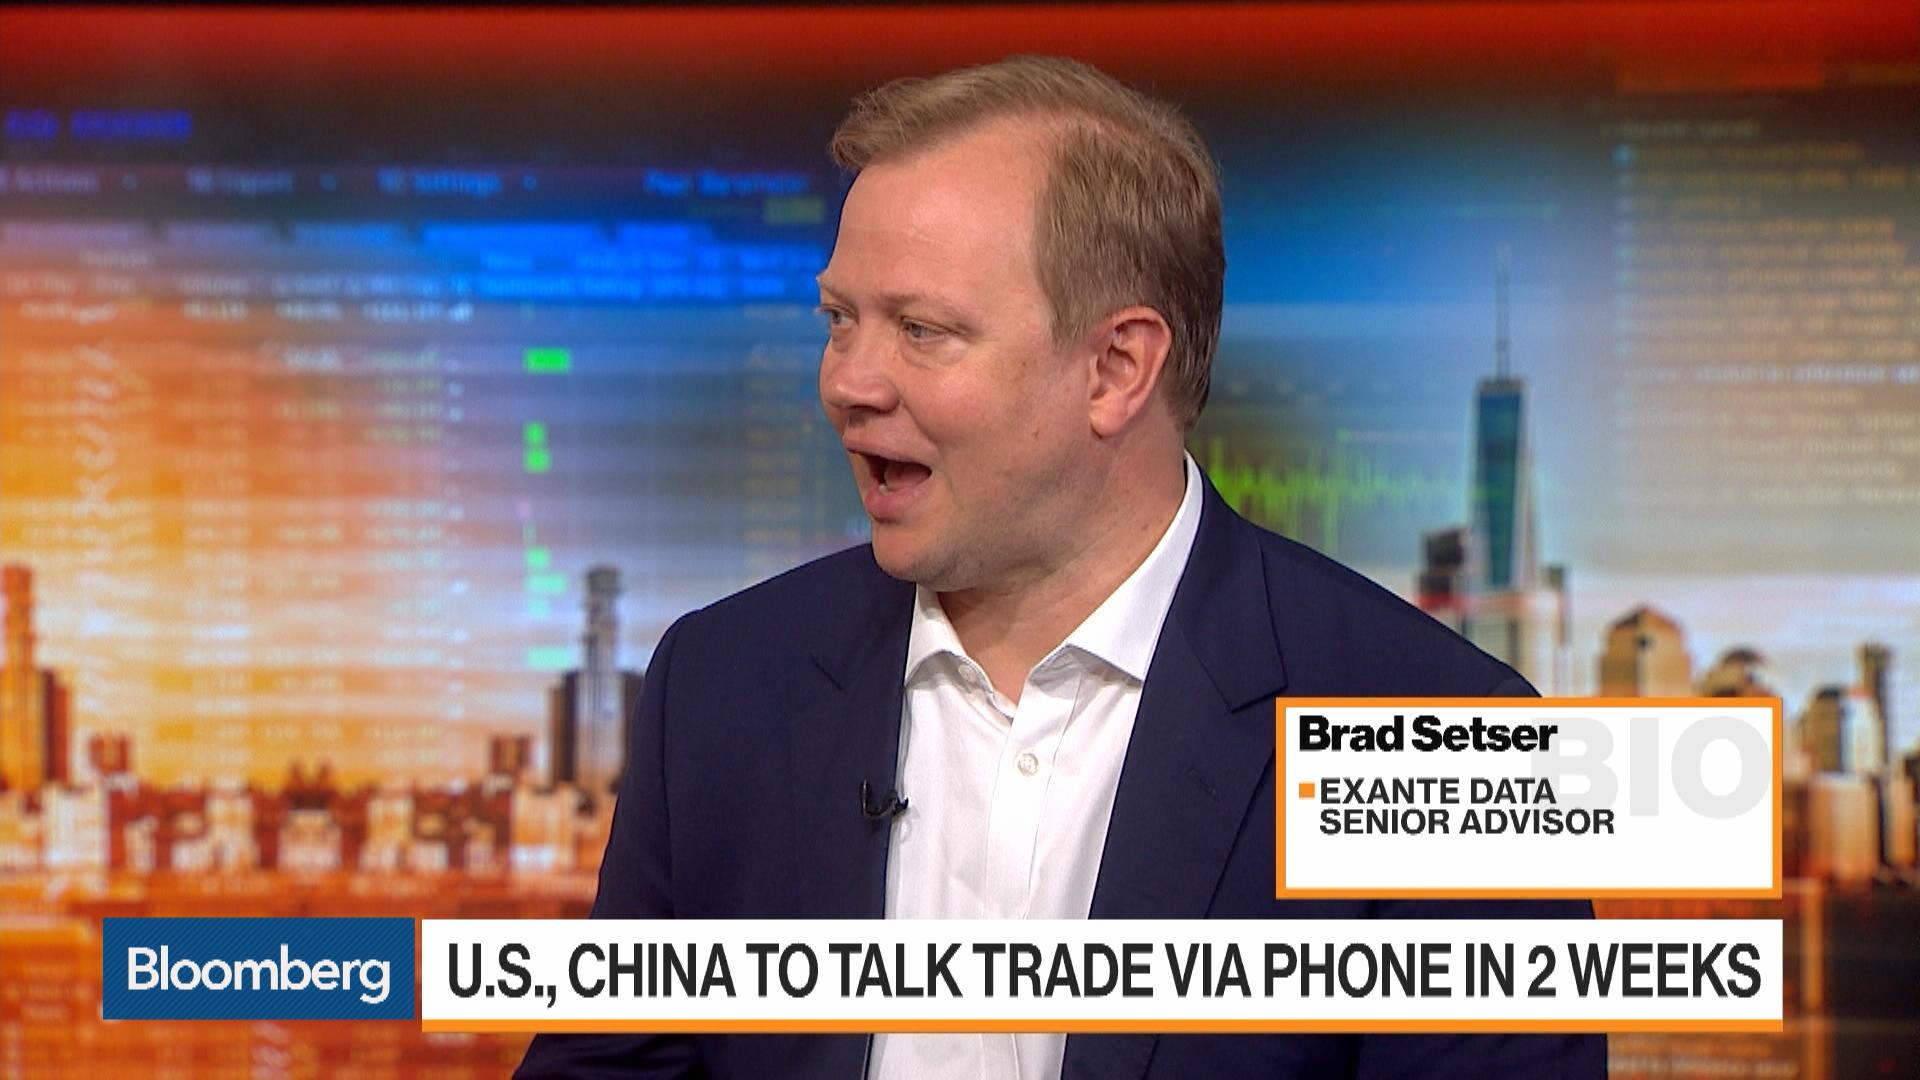 Trump Blinked With China Tariff Delay, Exante Data's Setser Says